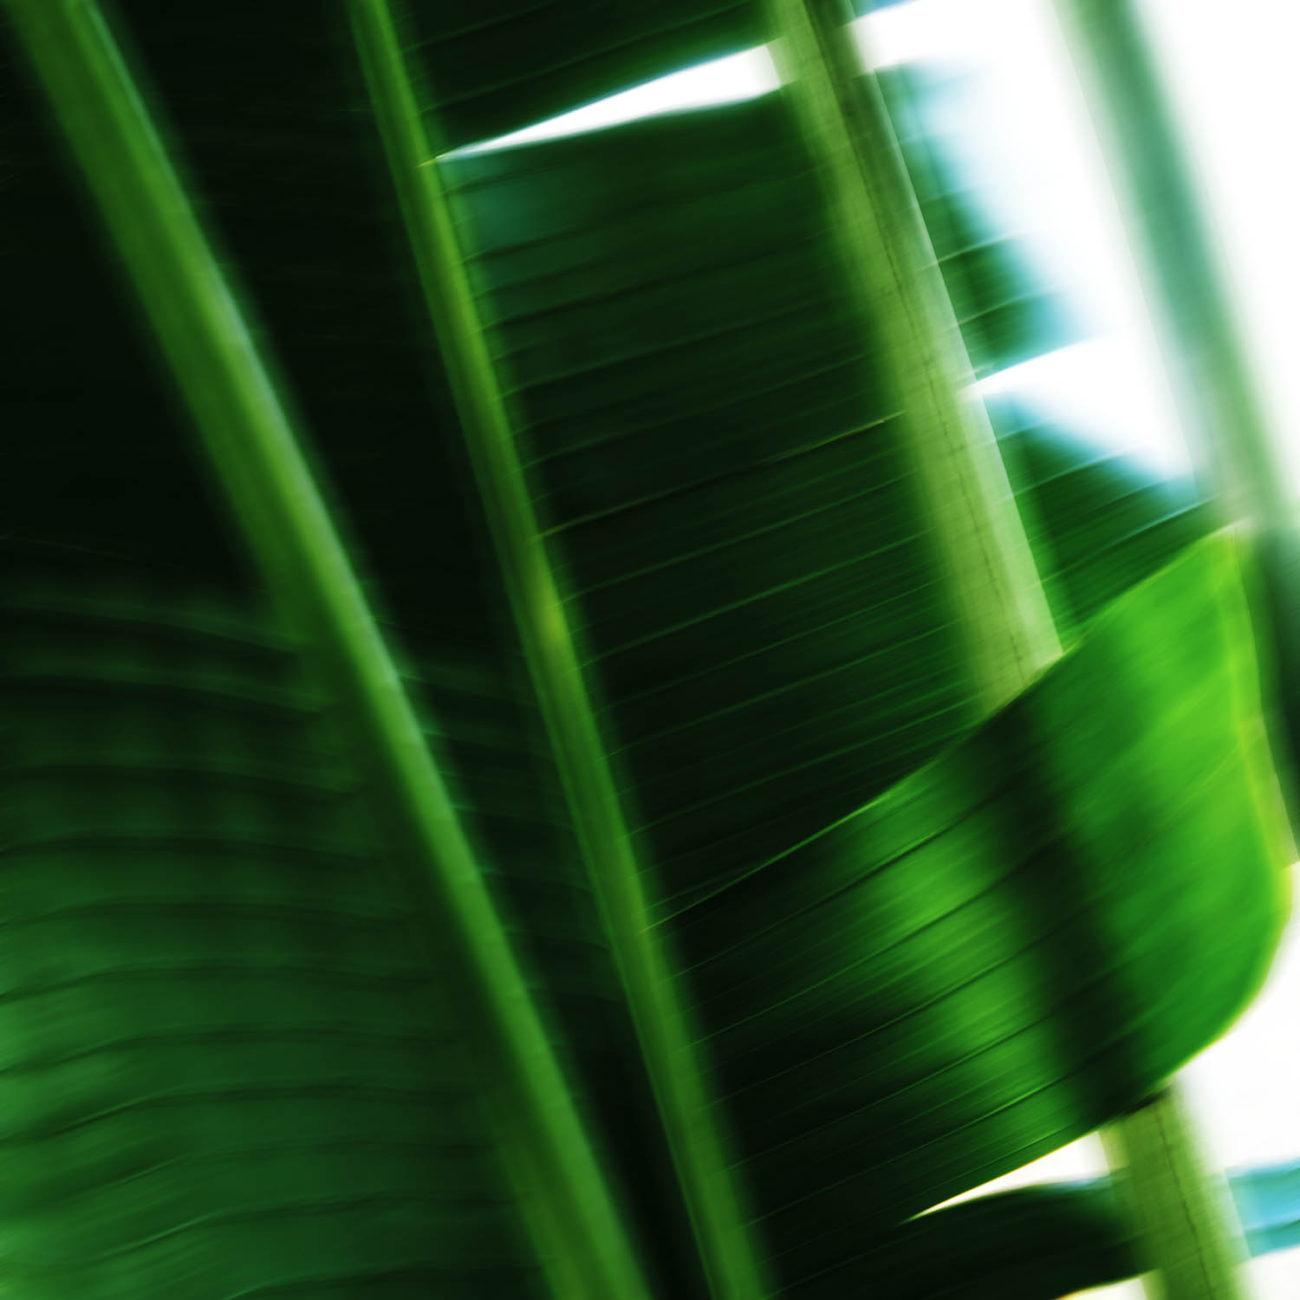 Banana leaf study